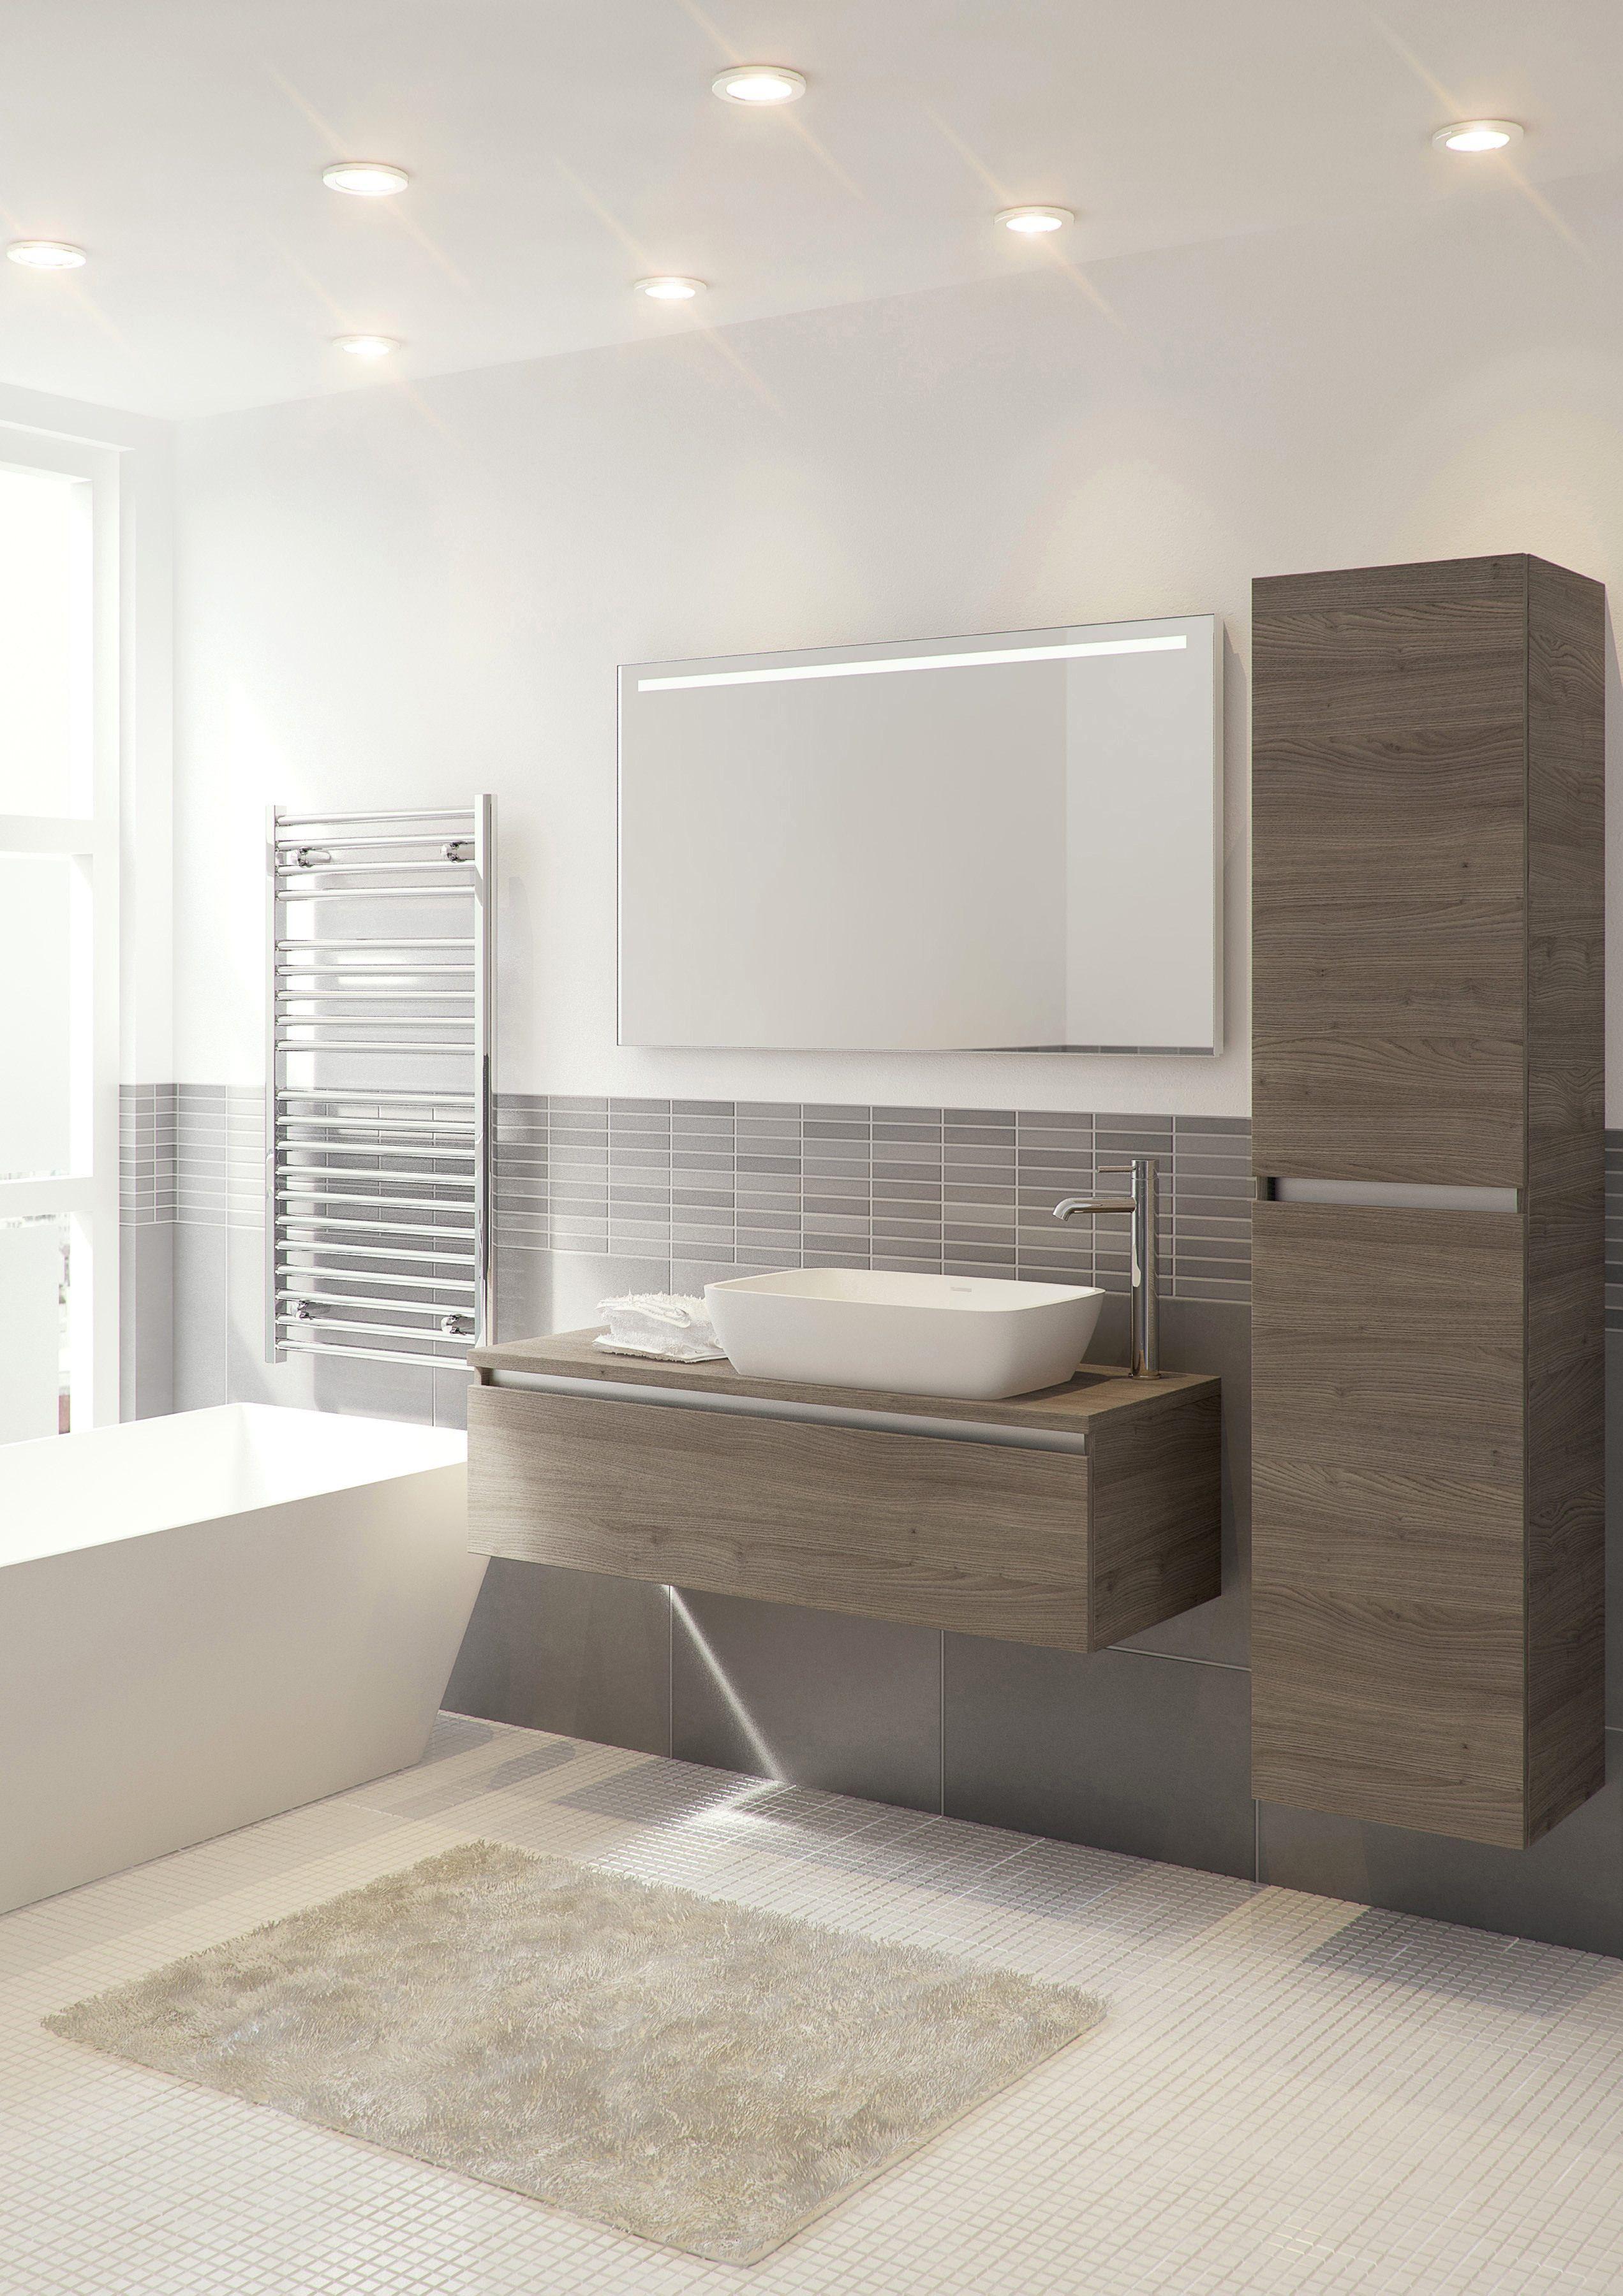 Unique Meuble Salle De Bain Point P Bathroom Bathroom Design Black Bathroom Flooring